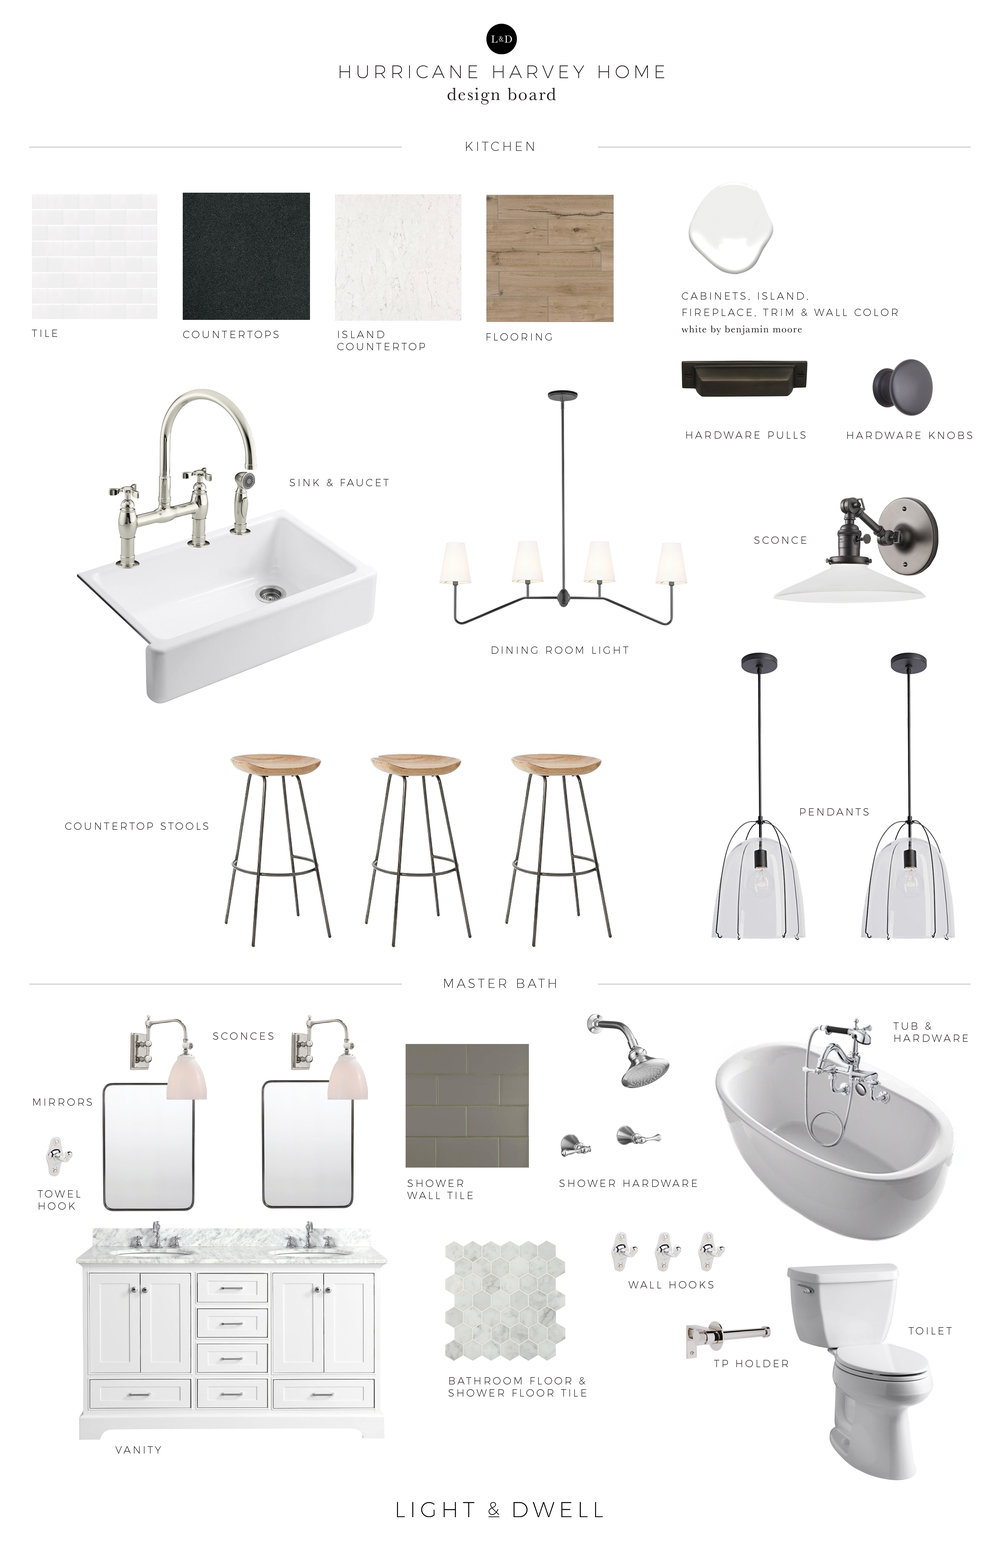 L+D_DesignBoard_HurricanHarveyHome.jpg